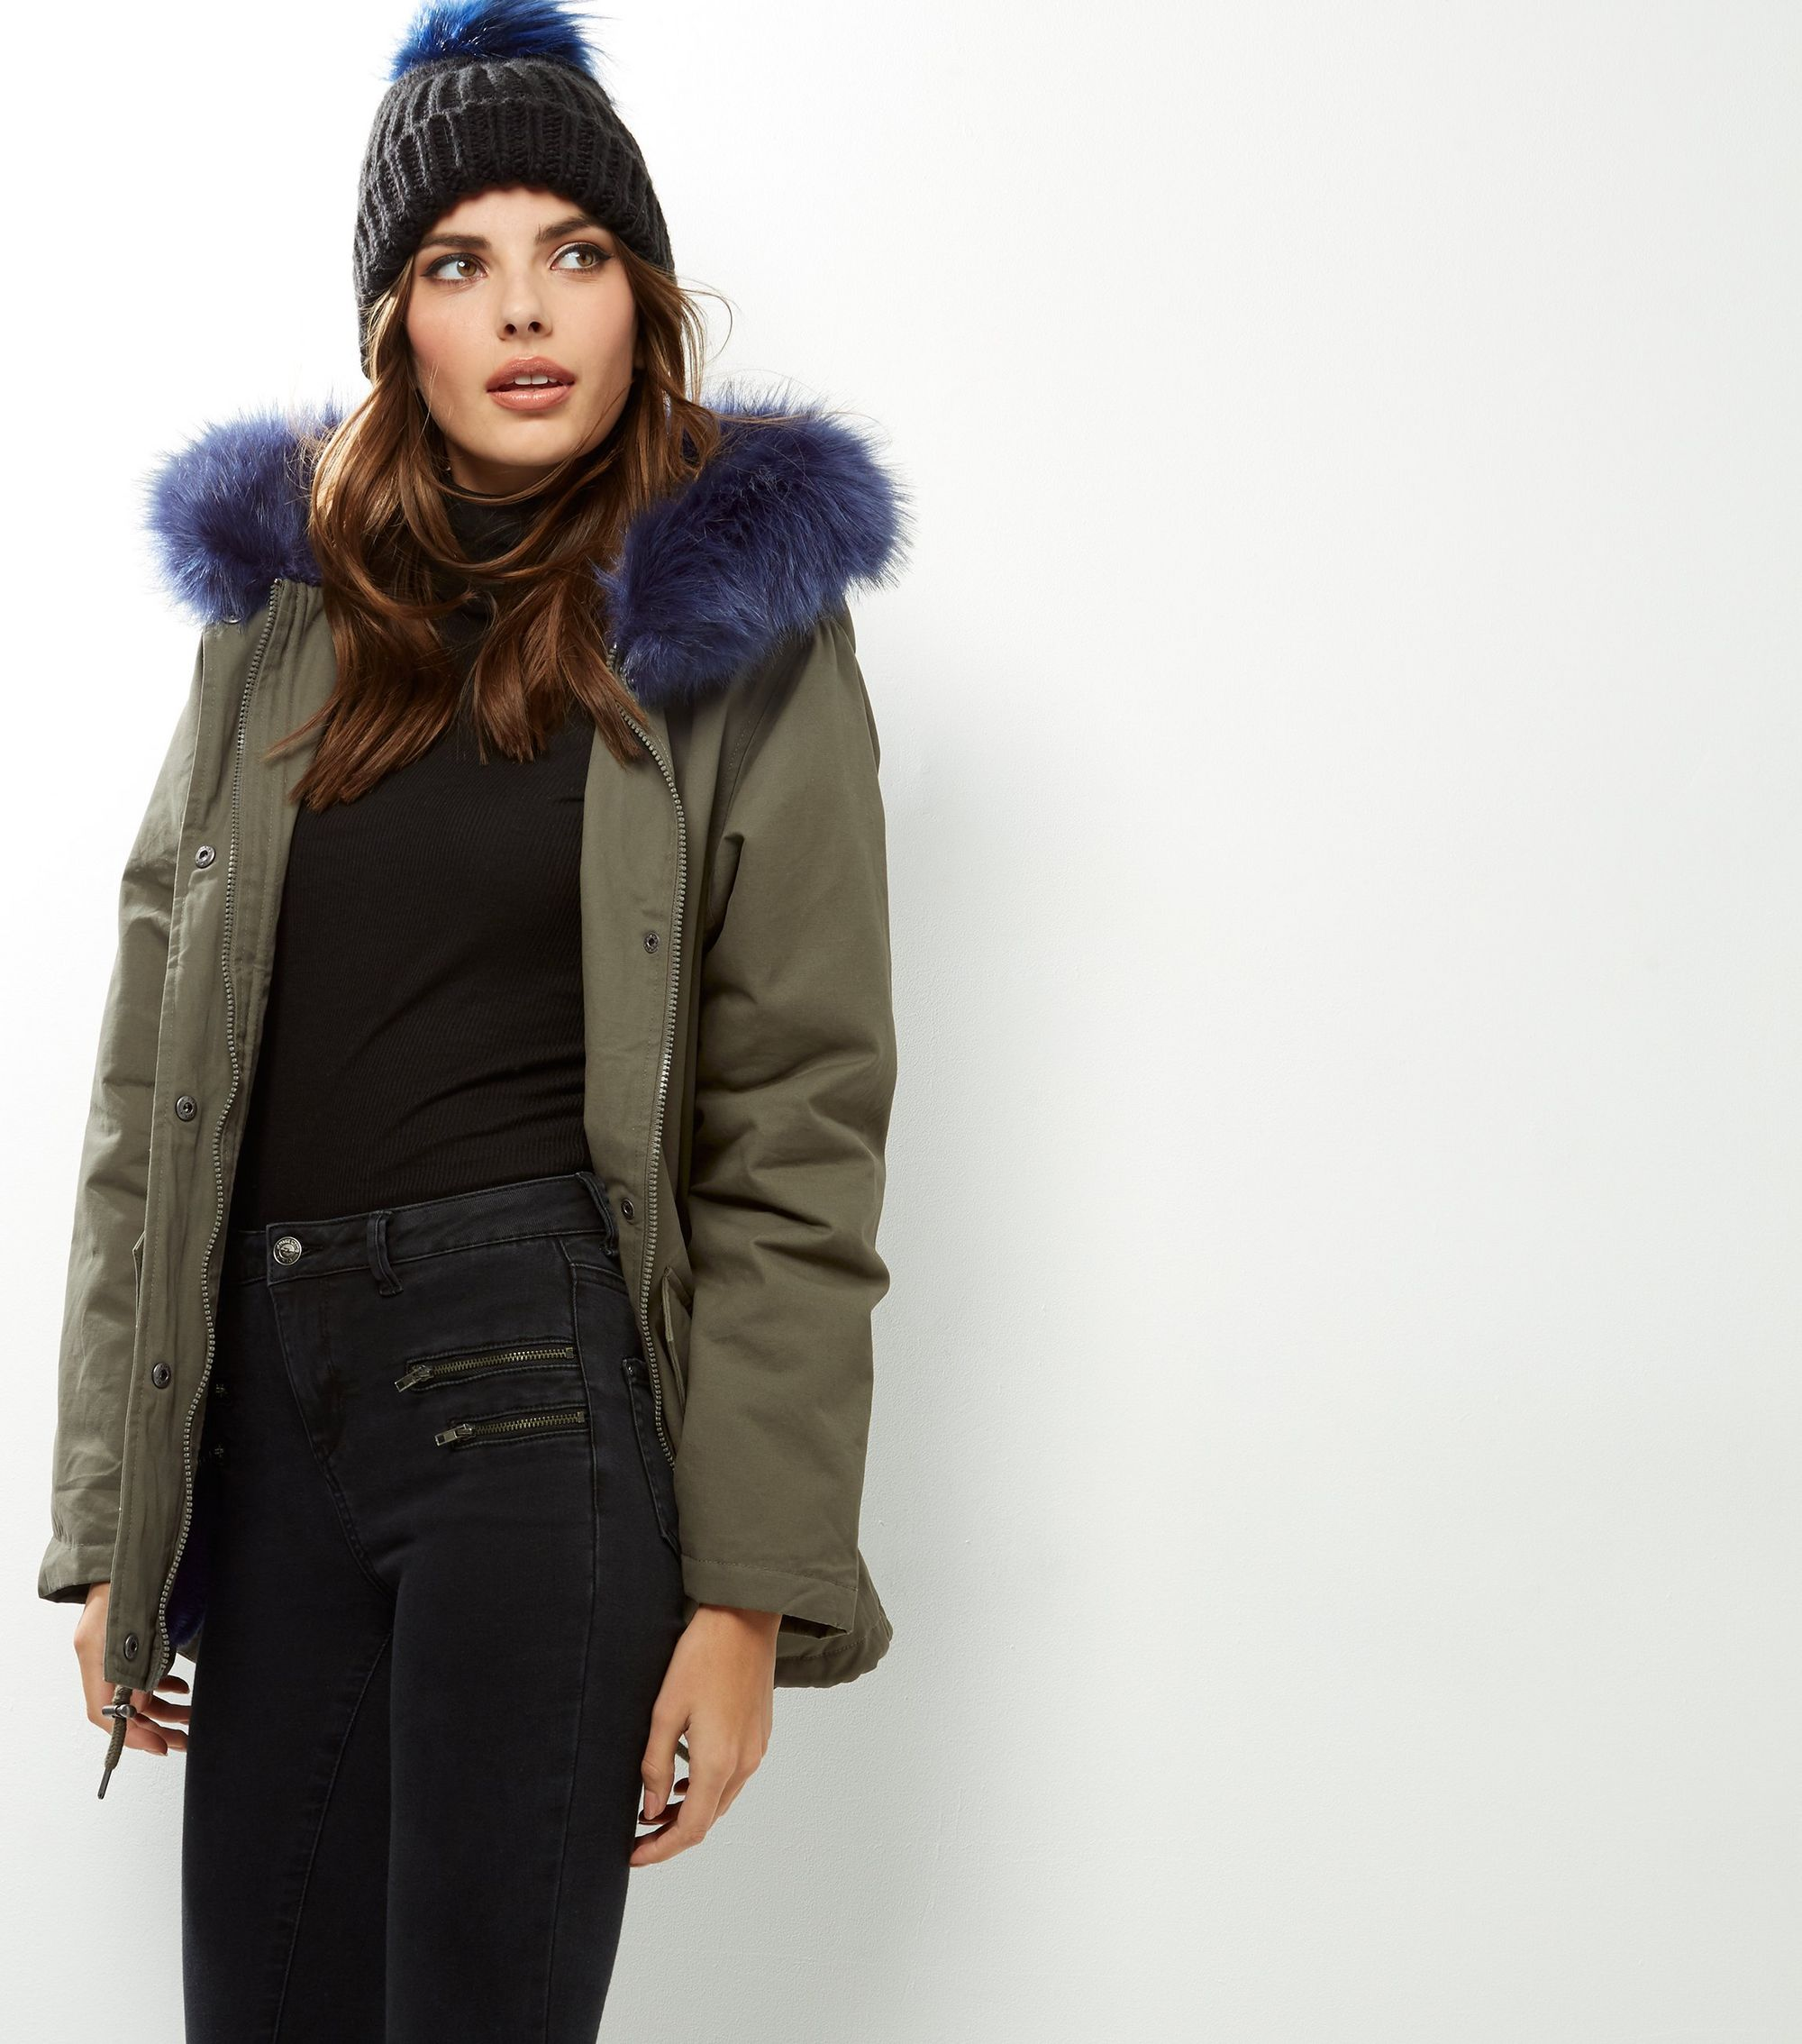 http://media.newlookassets.com/i/newlook/390092834/womens/jackets-and-coats/coats/khaki-faux-fur-trim-hooded-parka-/?$new_pdp_szoom_image_2000$